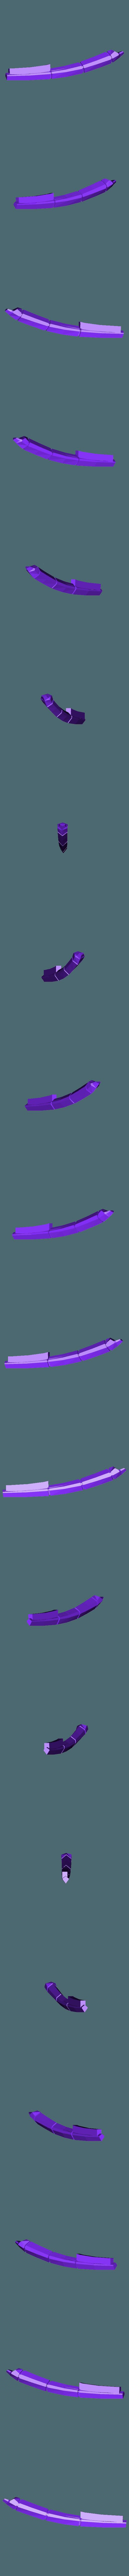 front_leg___spike.stl Download free STL file Serap-ta-tek BMF walker for Iron Undead • 3D printer model, JtStrait72